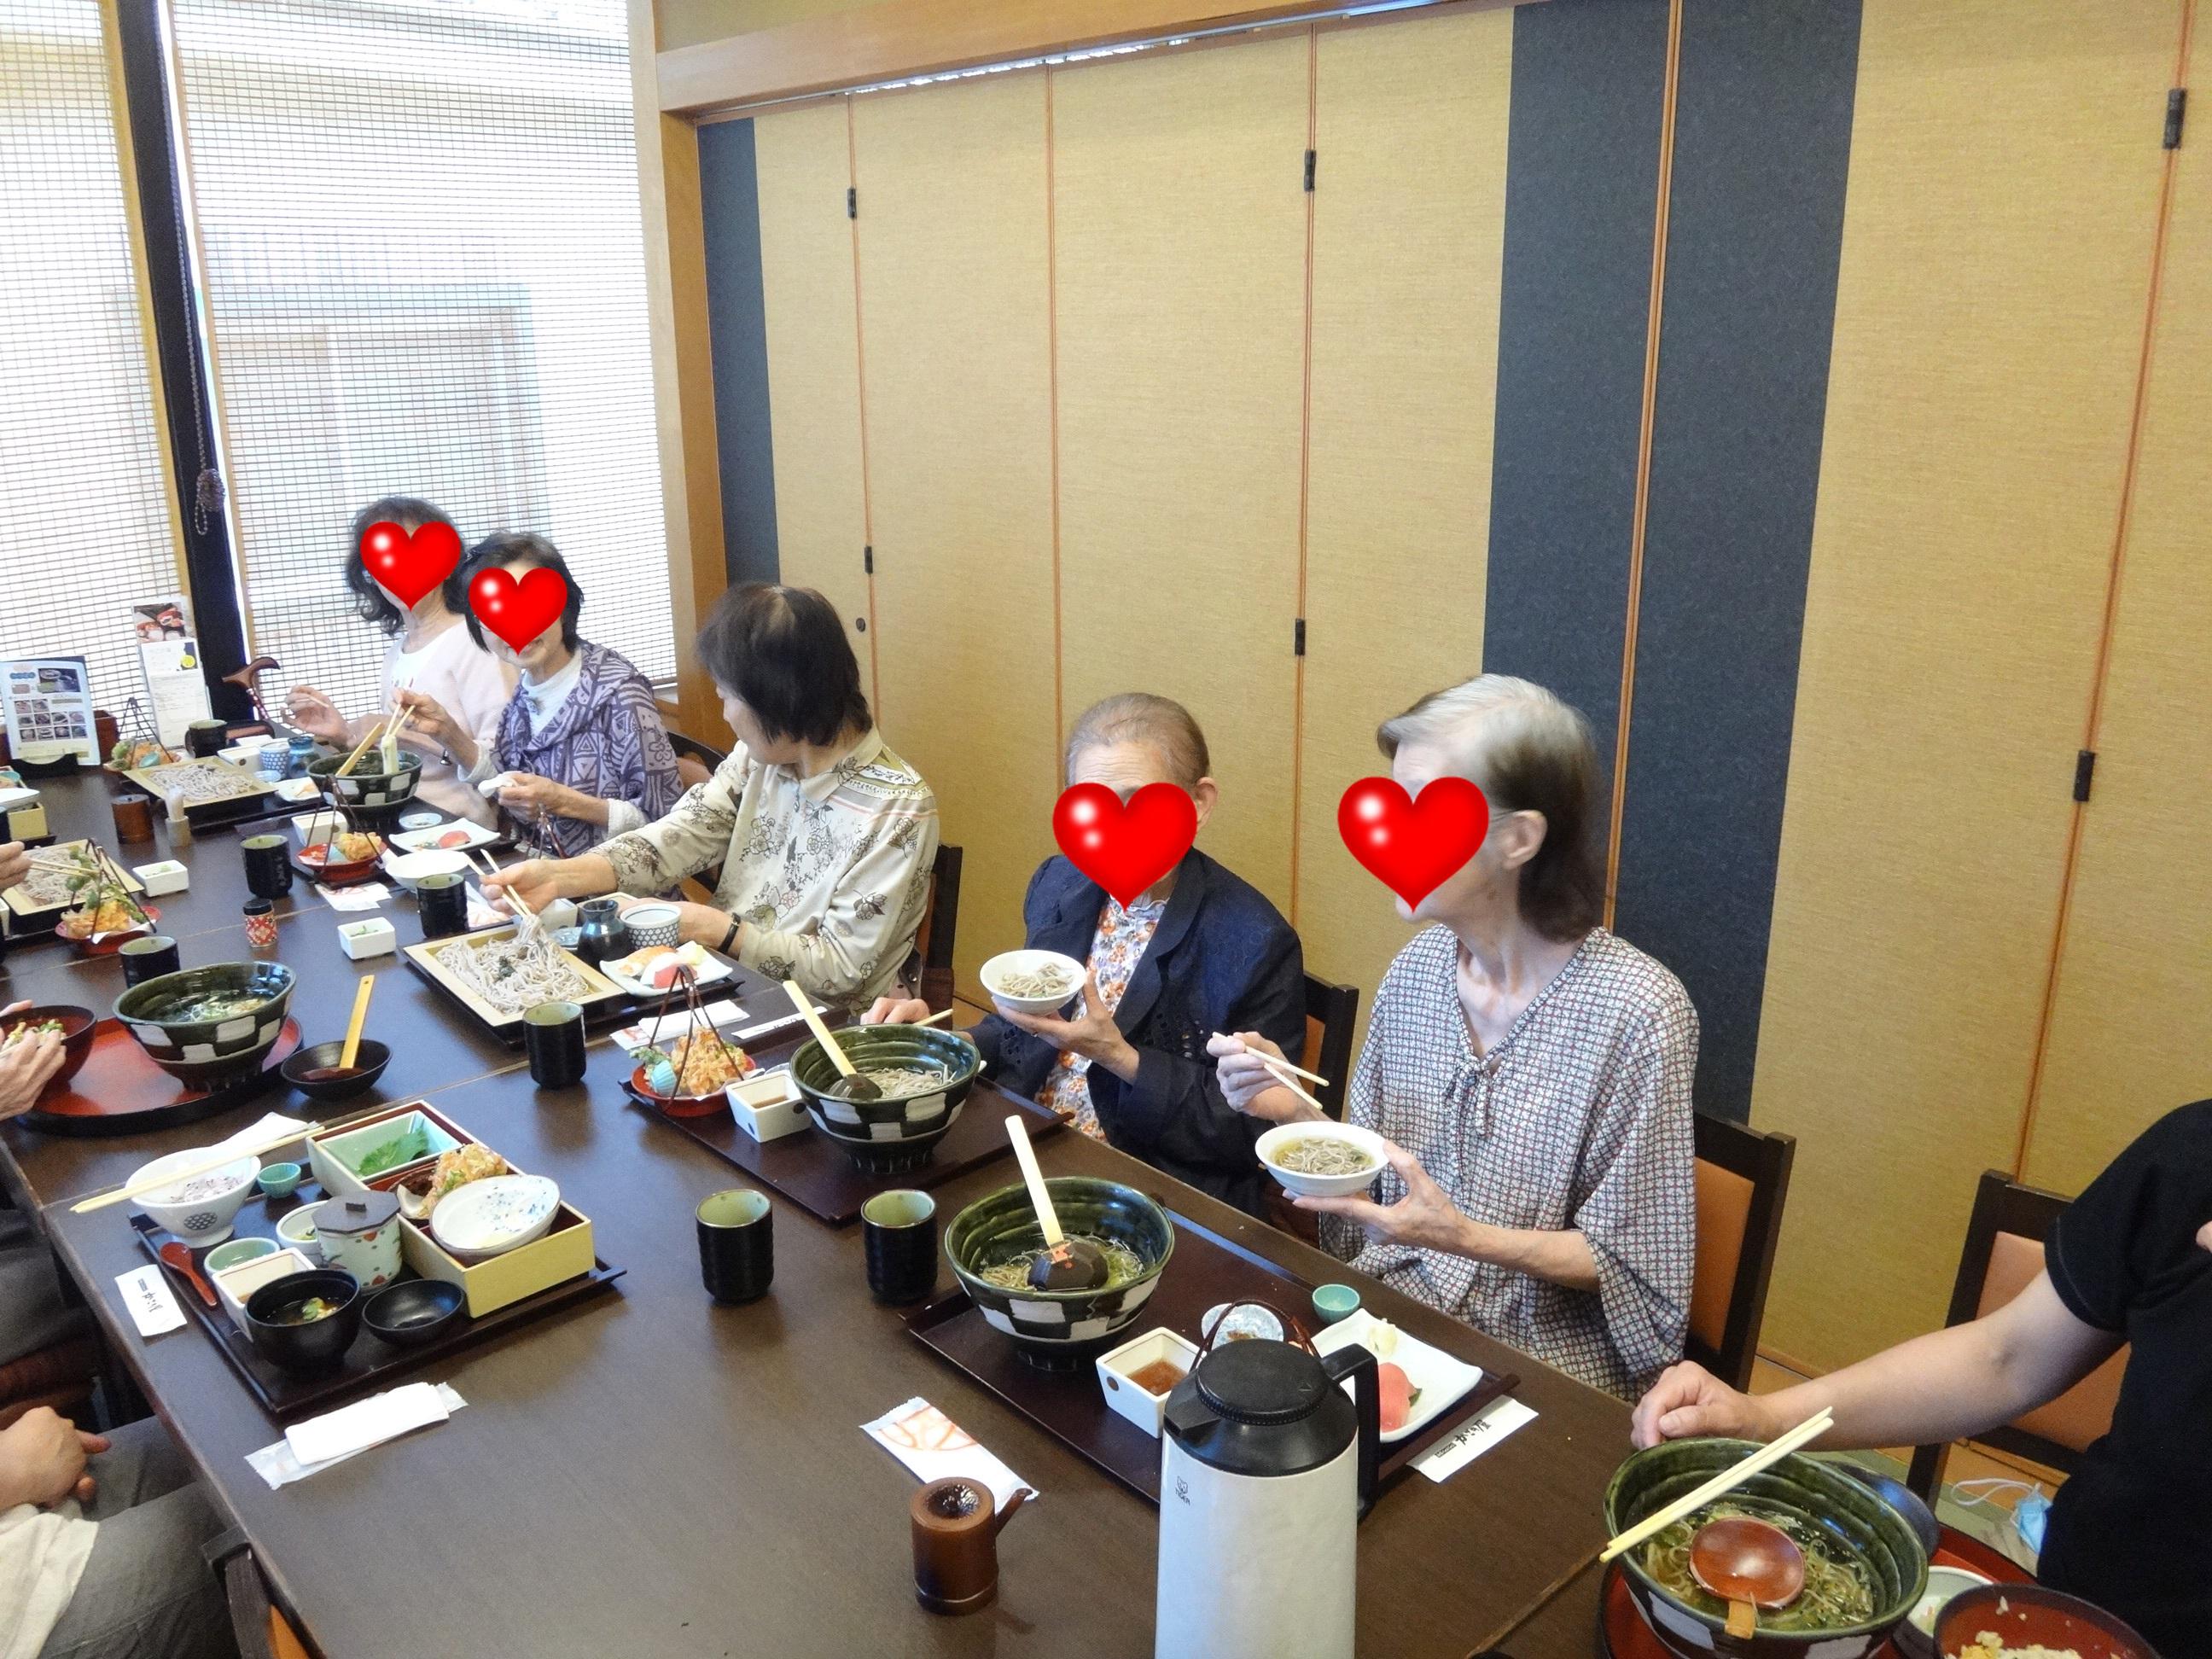 http://www.810810.co.jp/blog_run7/2015/06/05/DSC03155.JPG